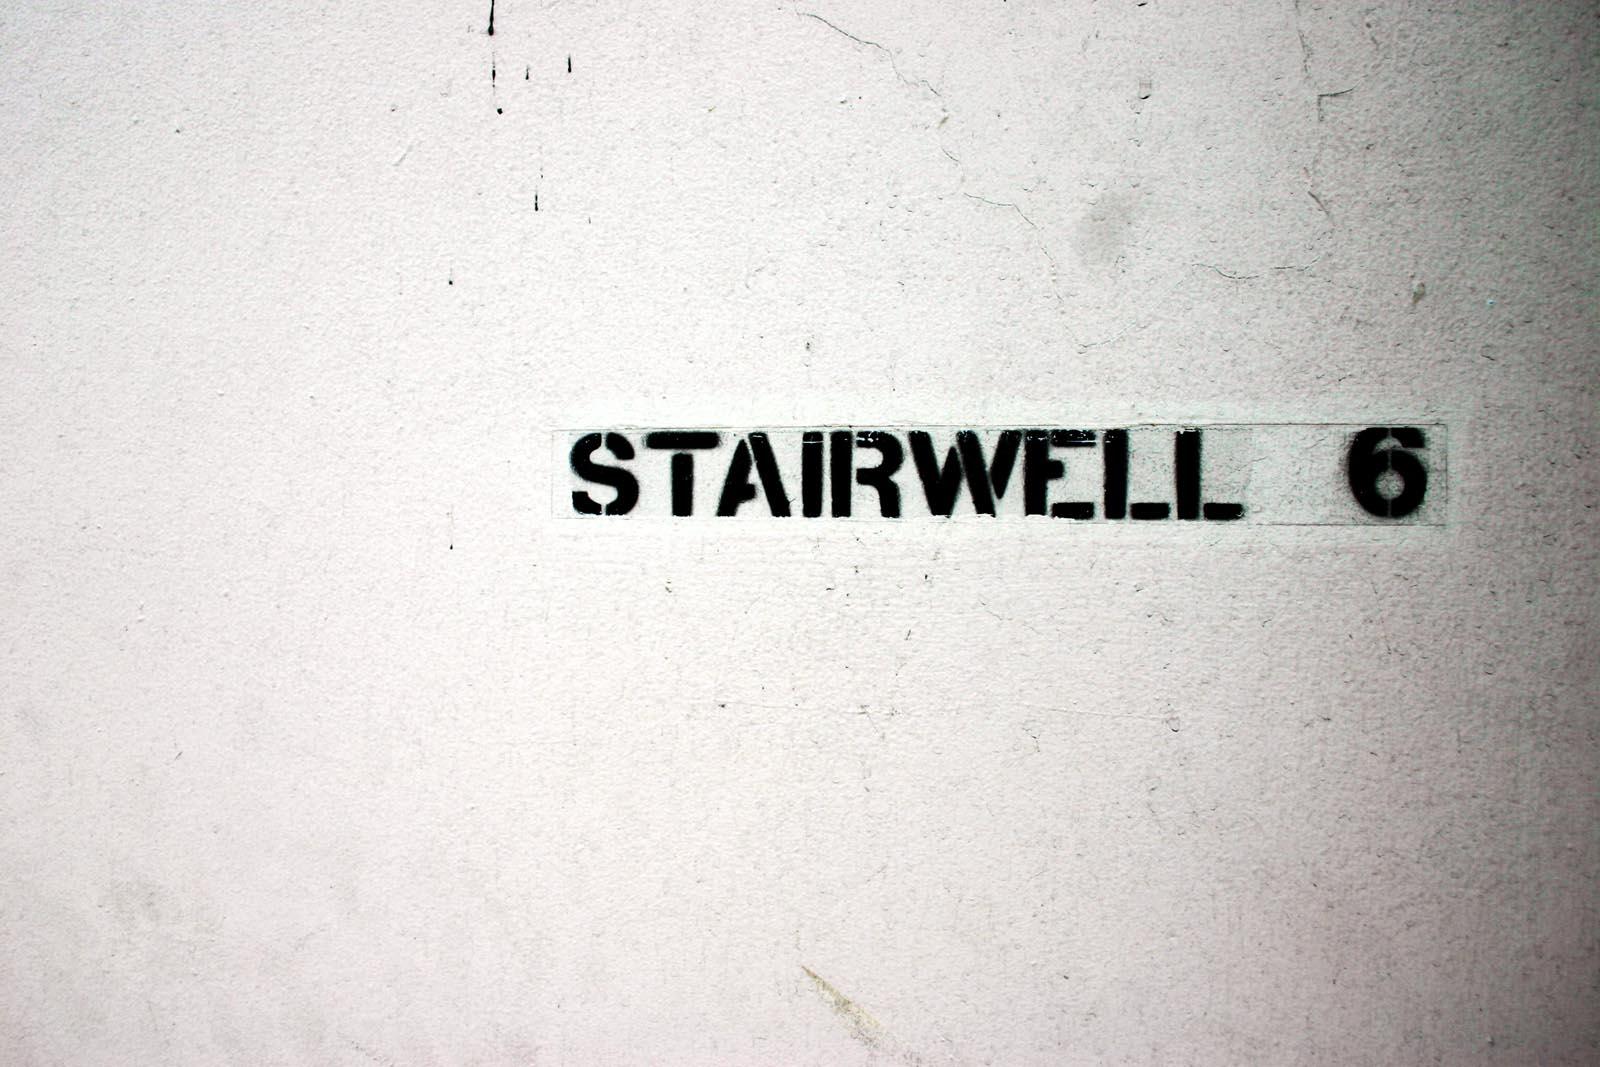 stairwell 6.jpg